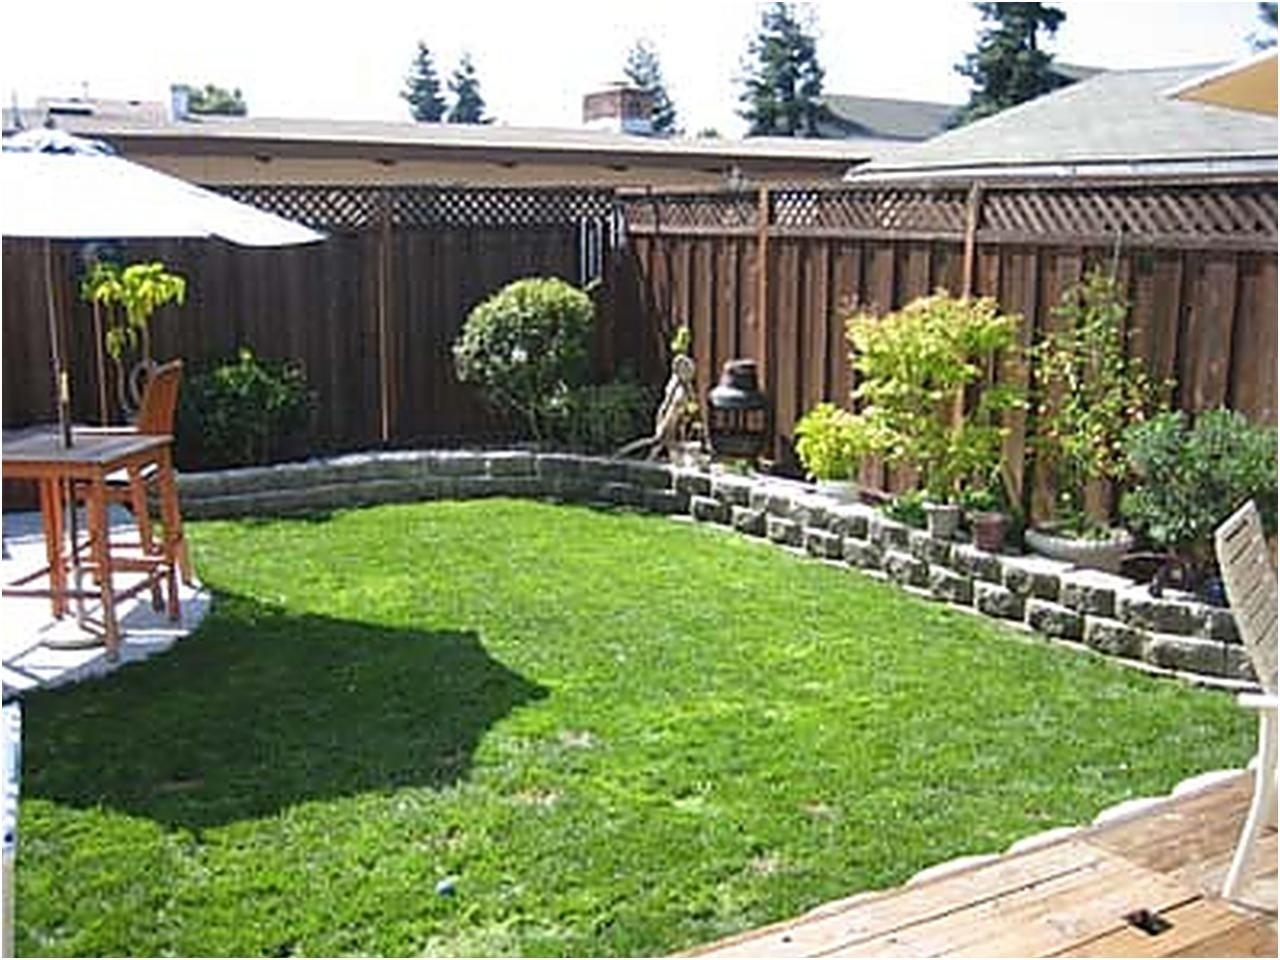 10 Attractive Low Maintenance Backyard Landscaping Ideas 2019 on Low Maintenance Backyard Design  id=55399